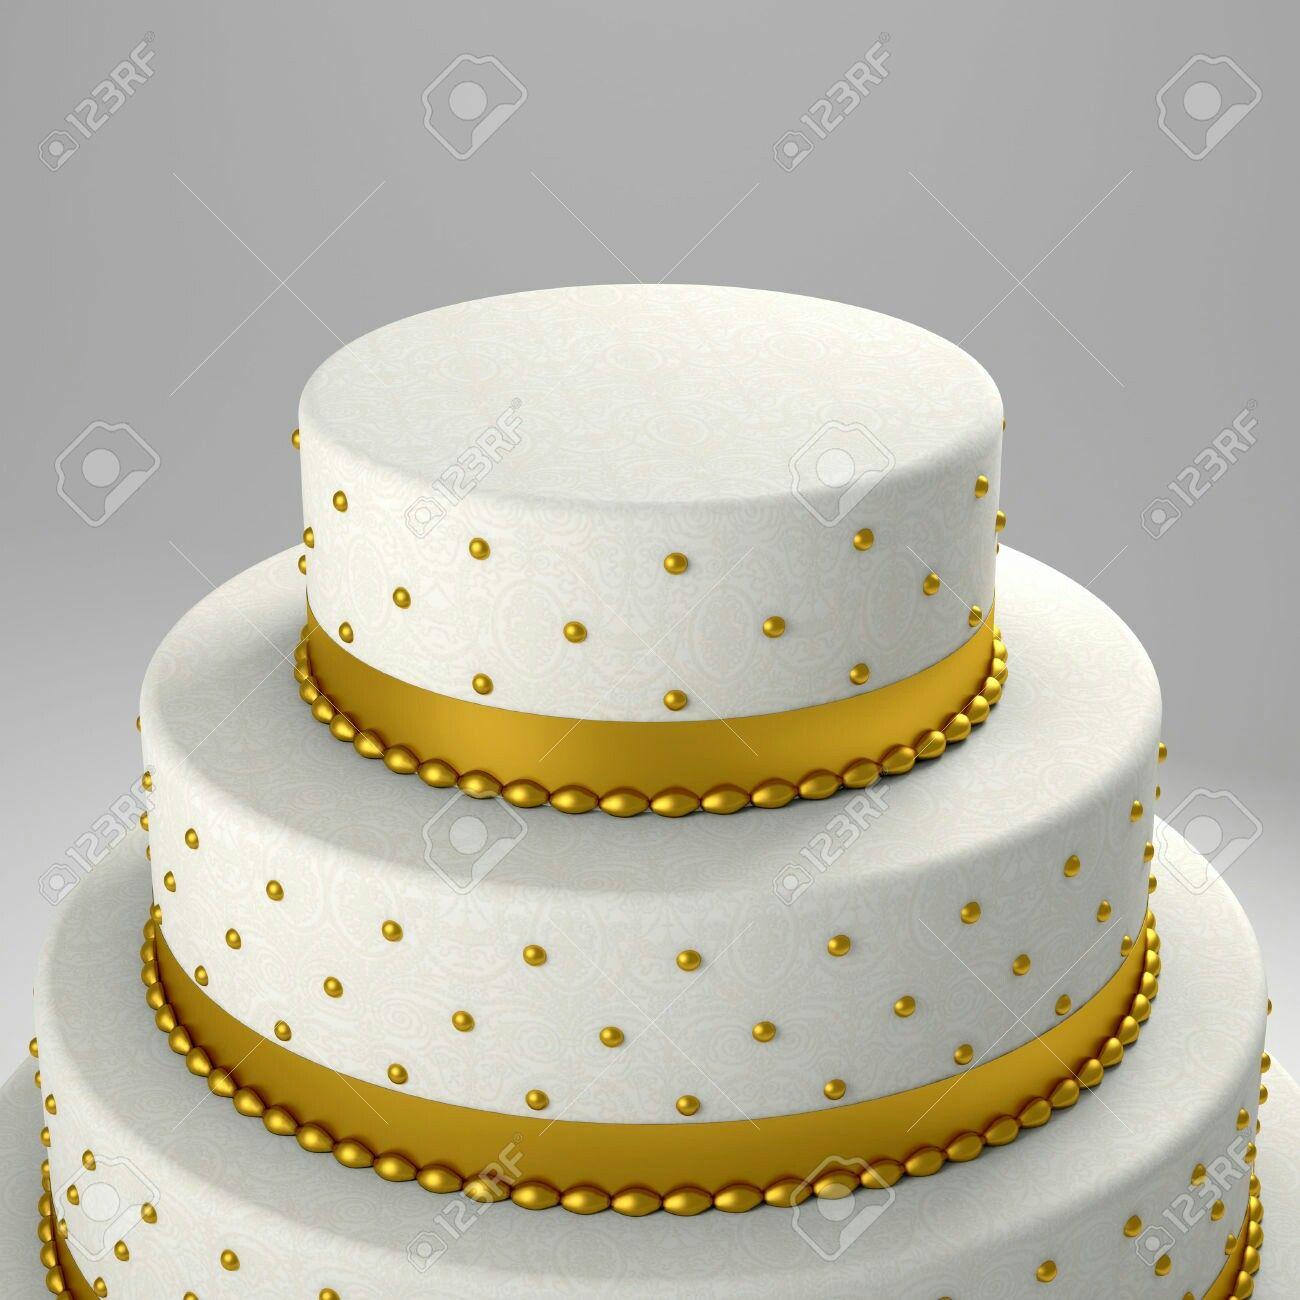 Golden Cake Gold Golden Cake Kuchen Ideen Torte Zur Goldenen Hochzeit Goldener Kuchen